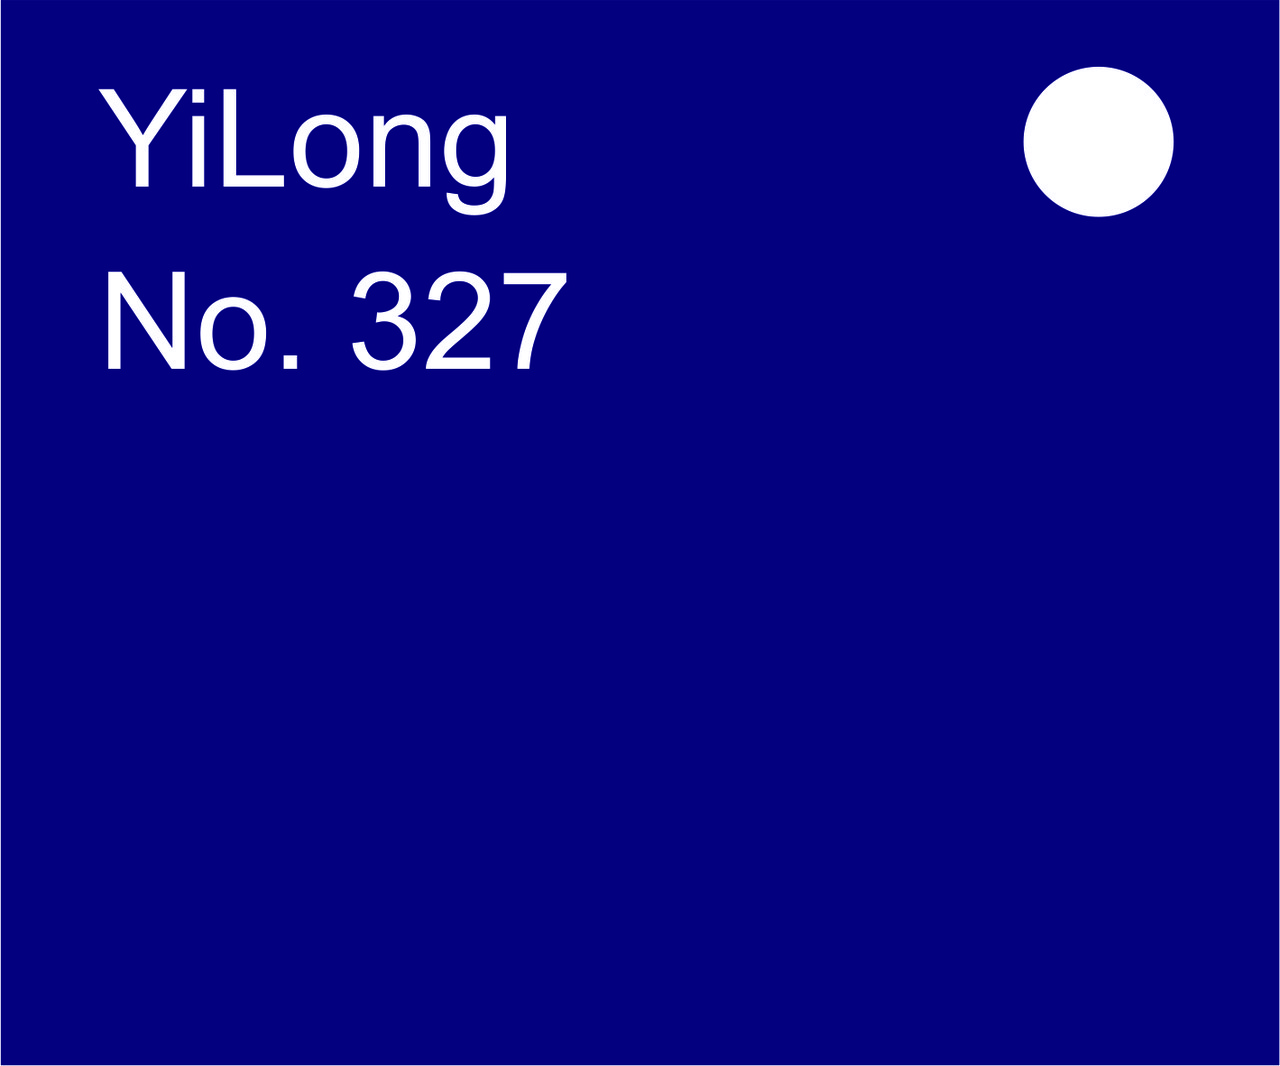 Акрил темно-синий 4мм (1,25м х 2,48м)